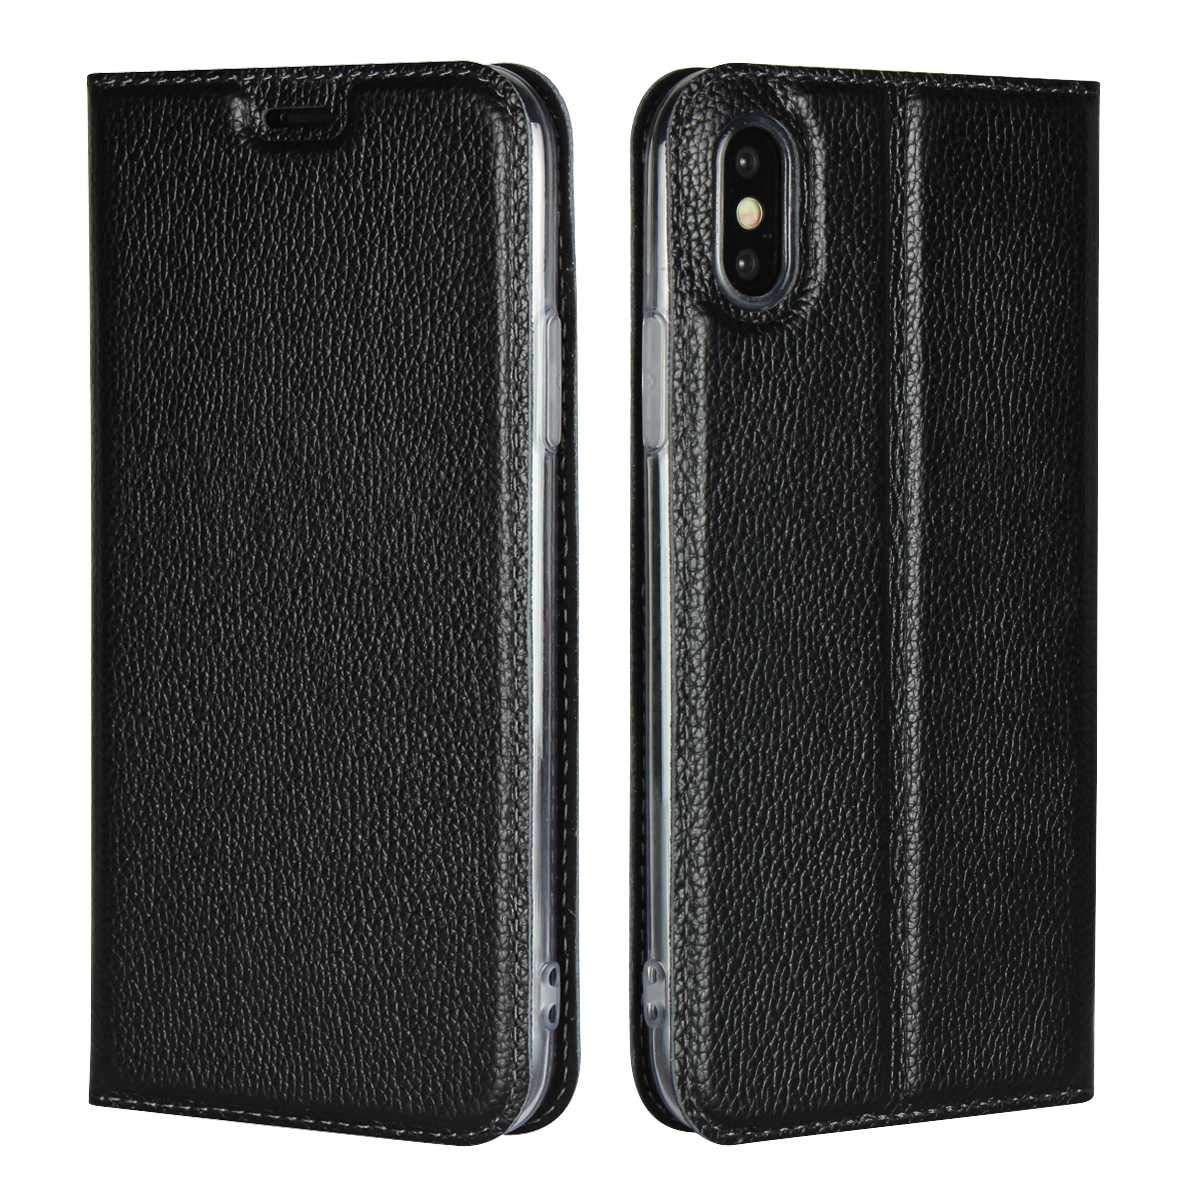 Thrion Coque iPhone XR, Housse iPhone XR, PU Etui en Cuir Portefeuille de Protection - Noir ThrFR22-IXR-H01